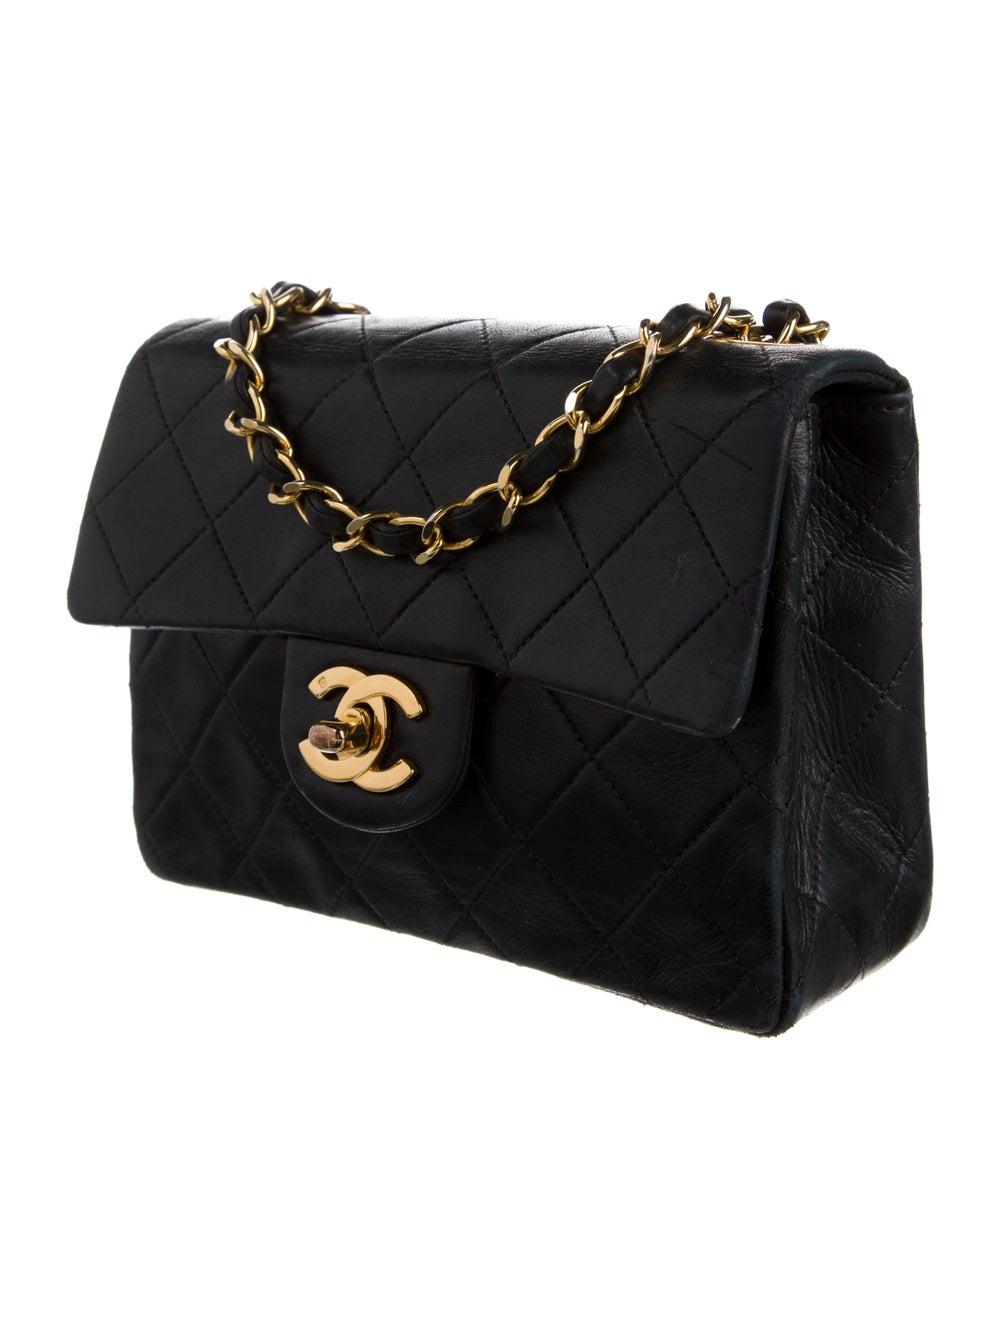 Chanel Vintage Mini Square Flap Bag Blue - image 3